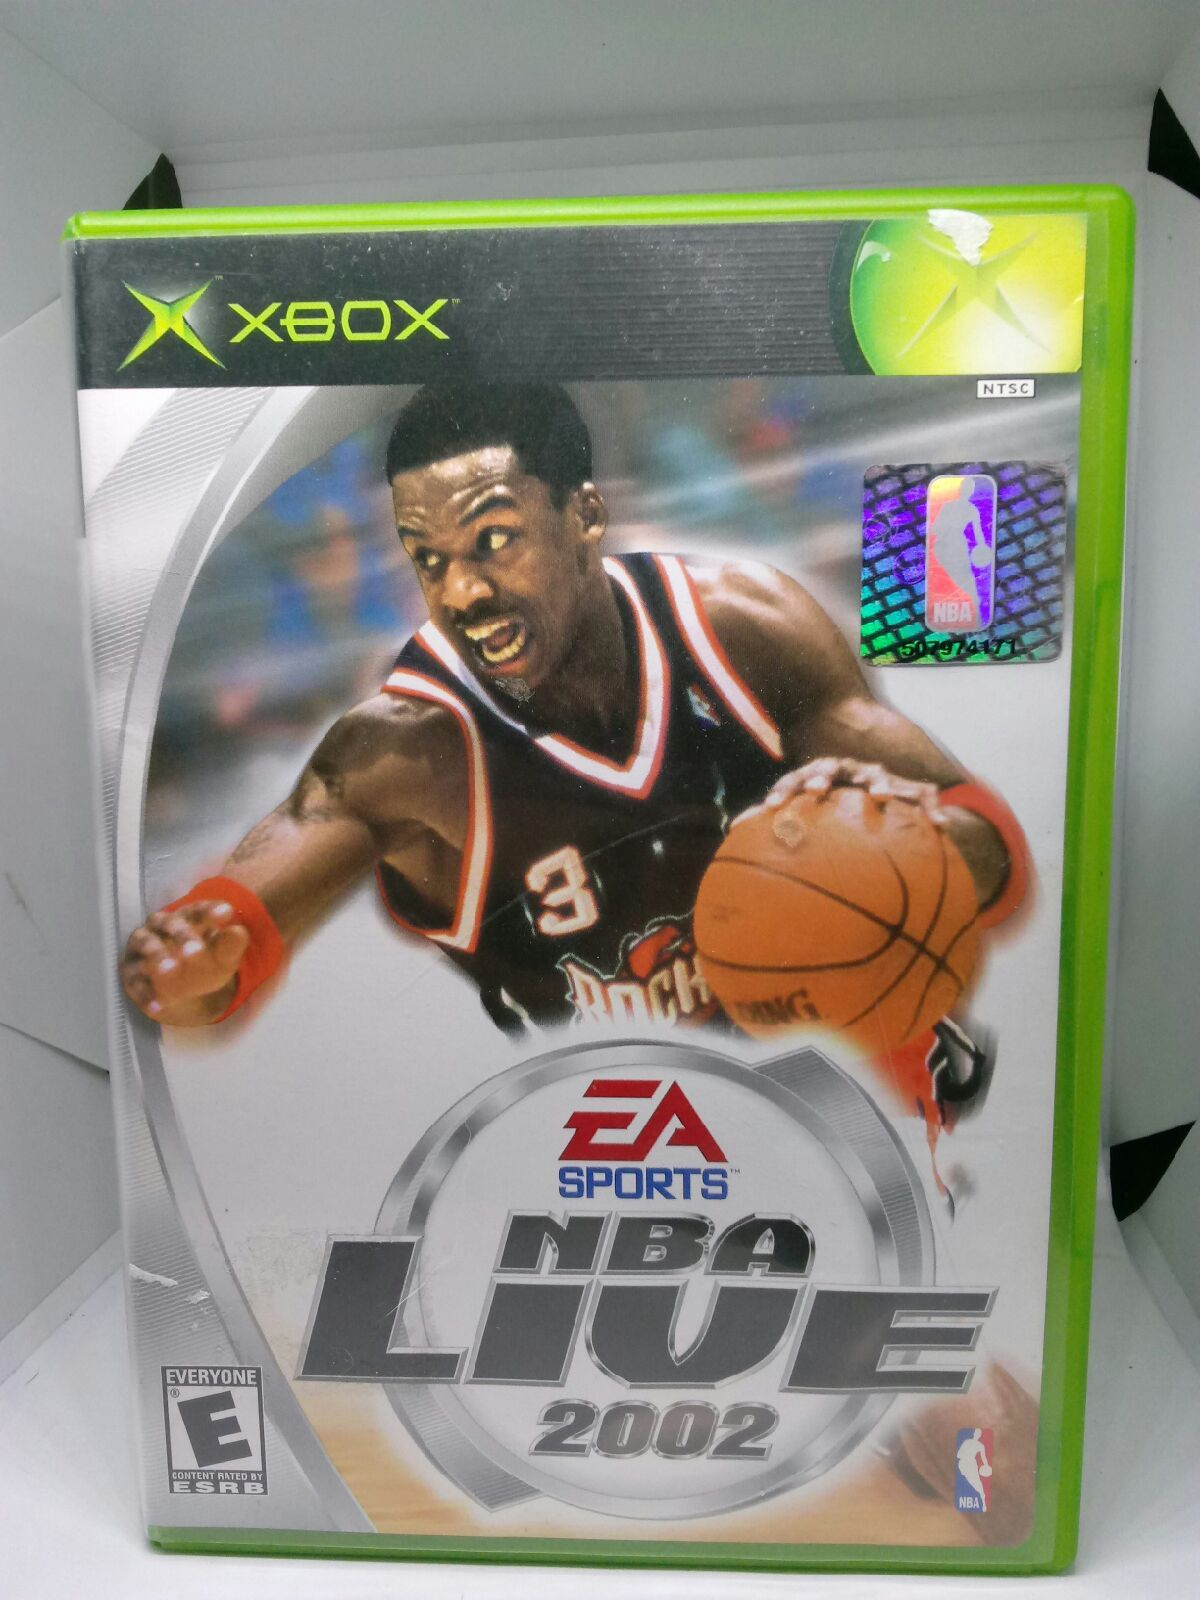 EA SPORTS NBA LIVE 2002 Original XBOX GAME Good condition